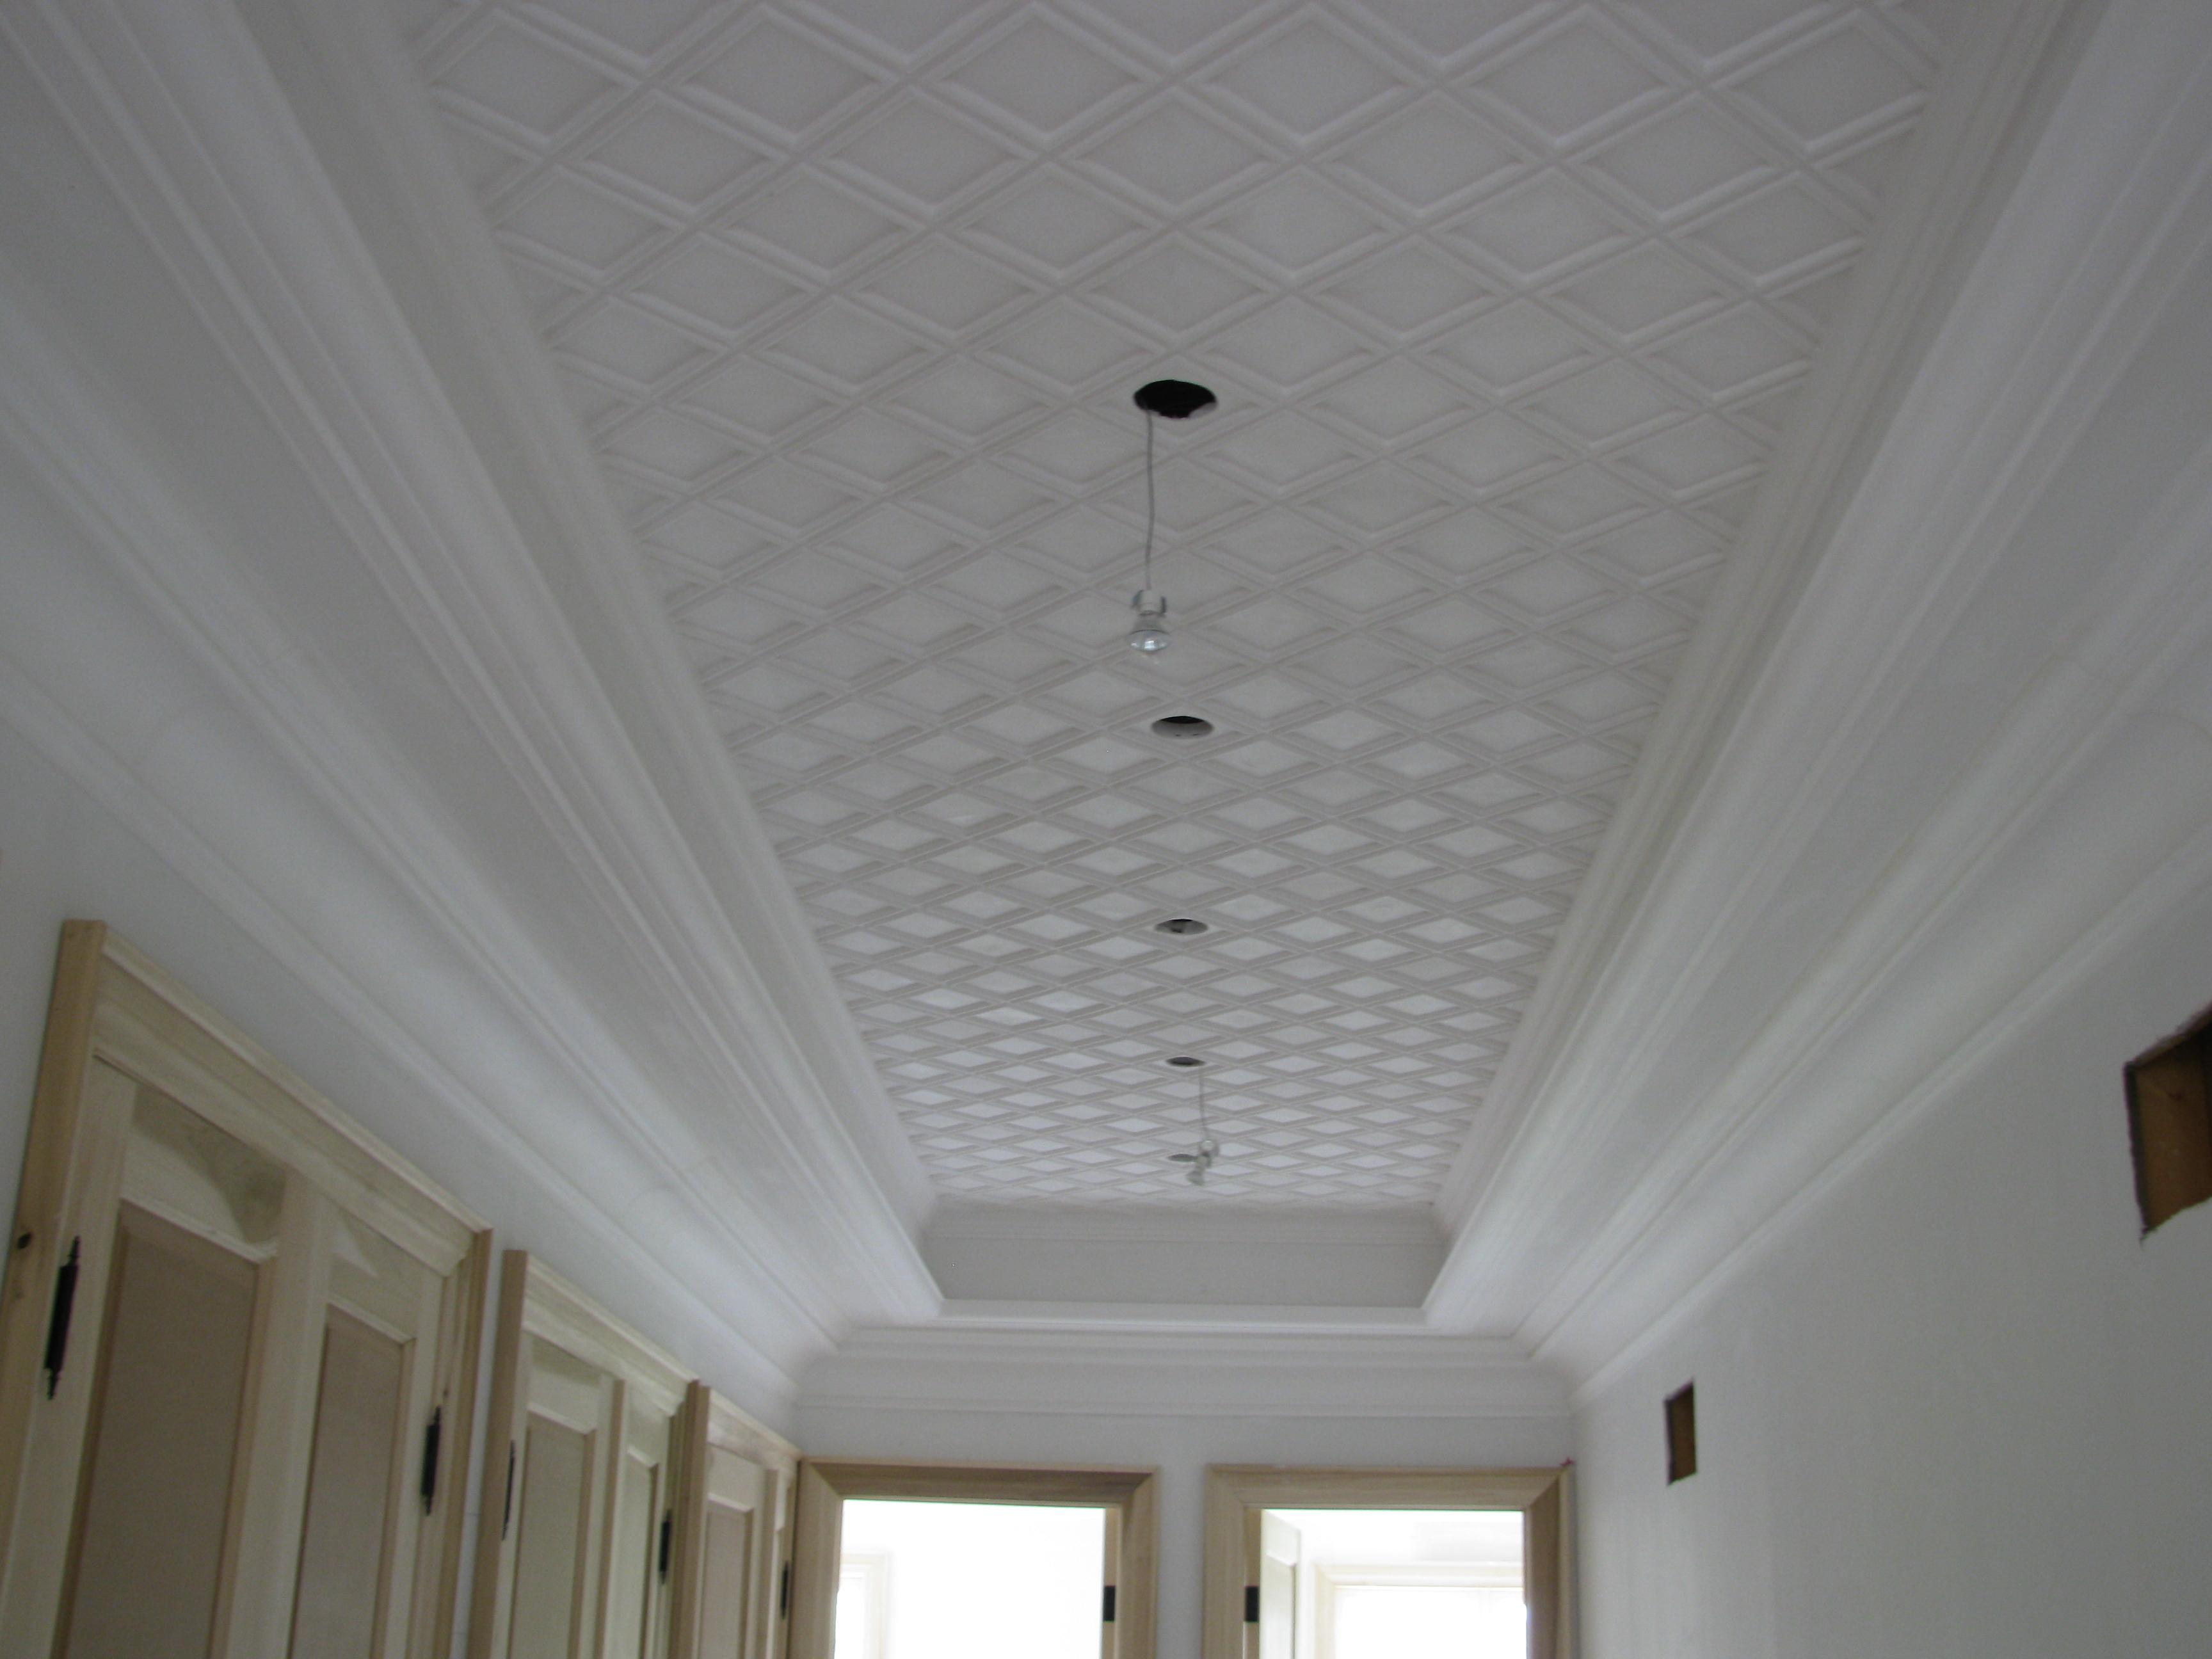 Hallway ceiling tile